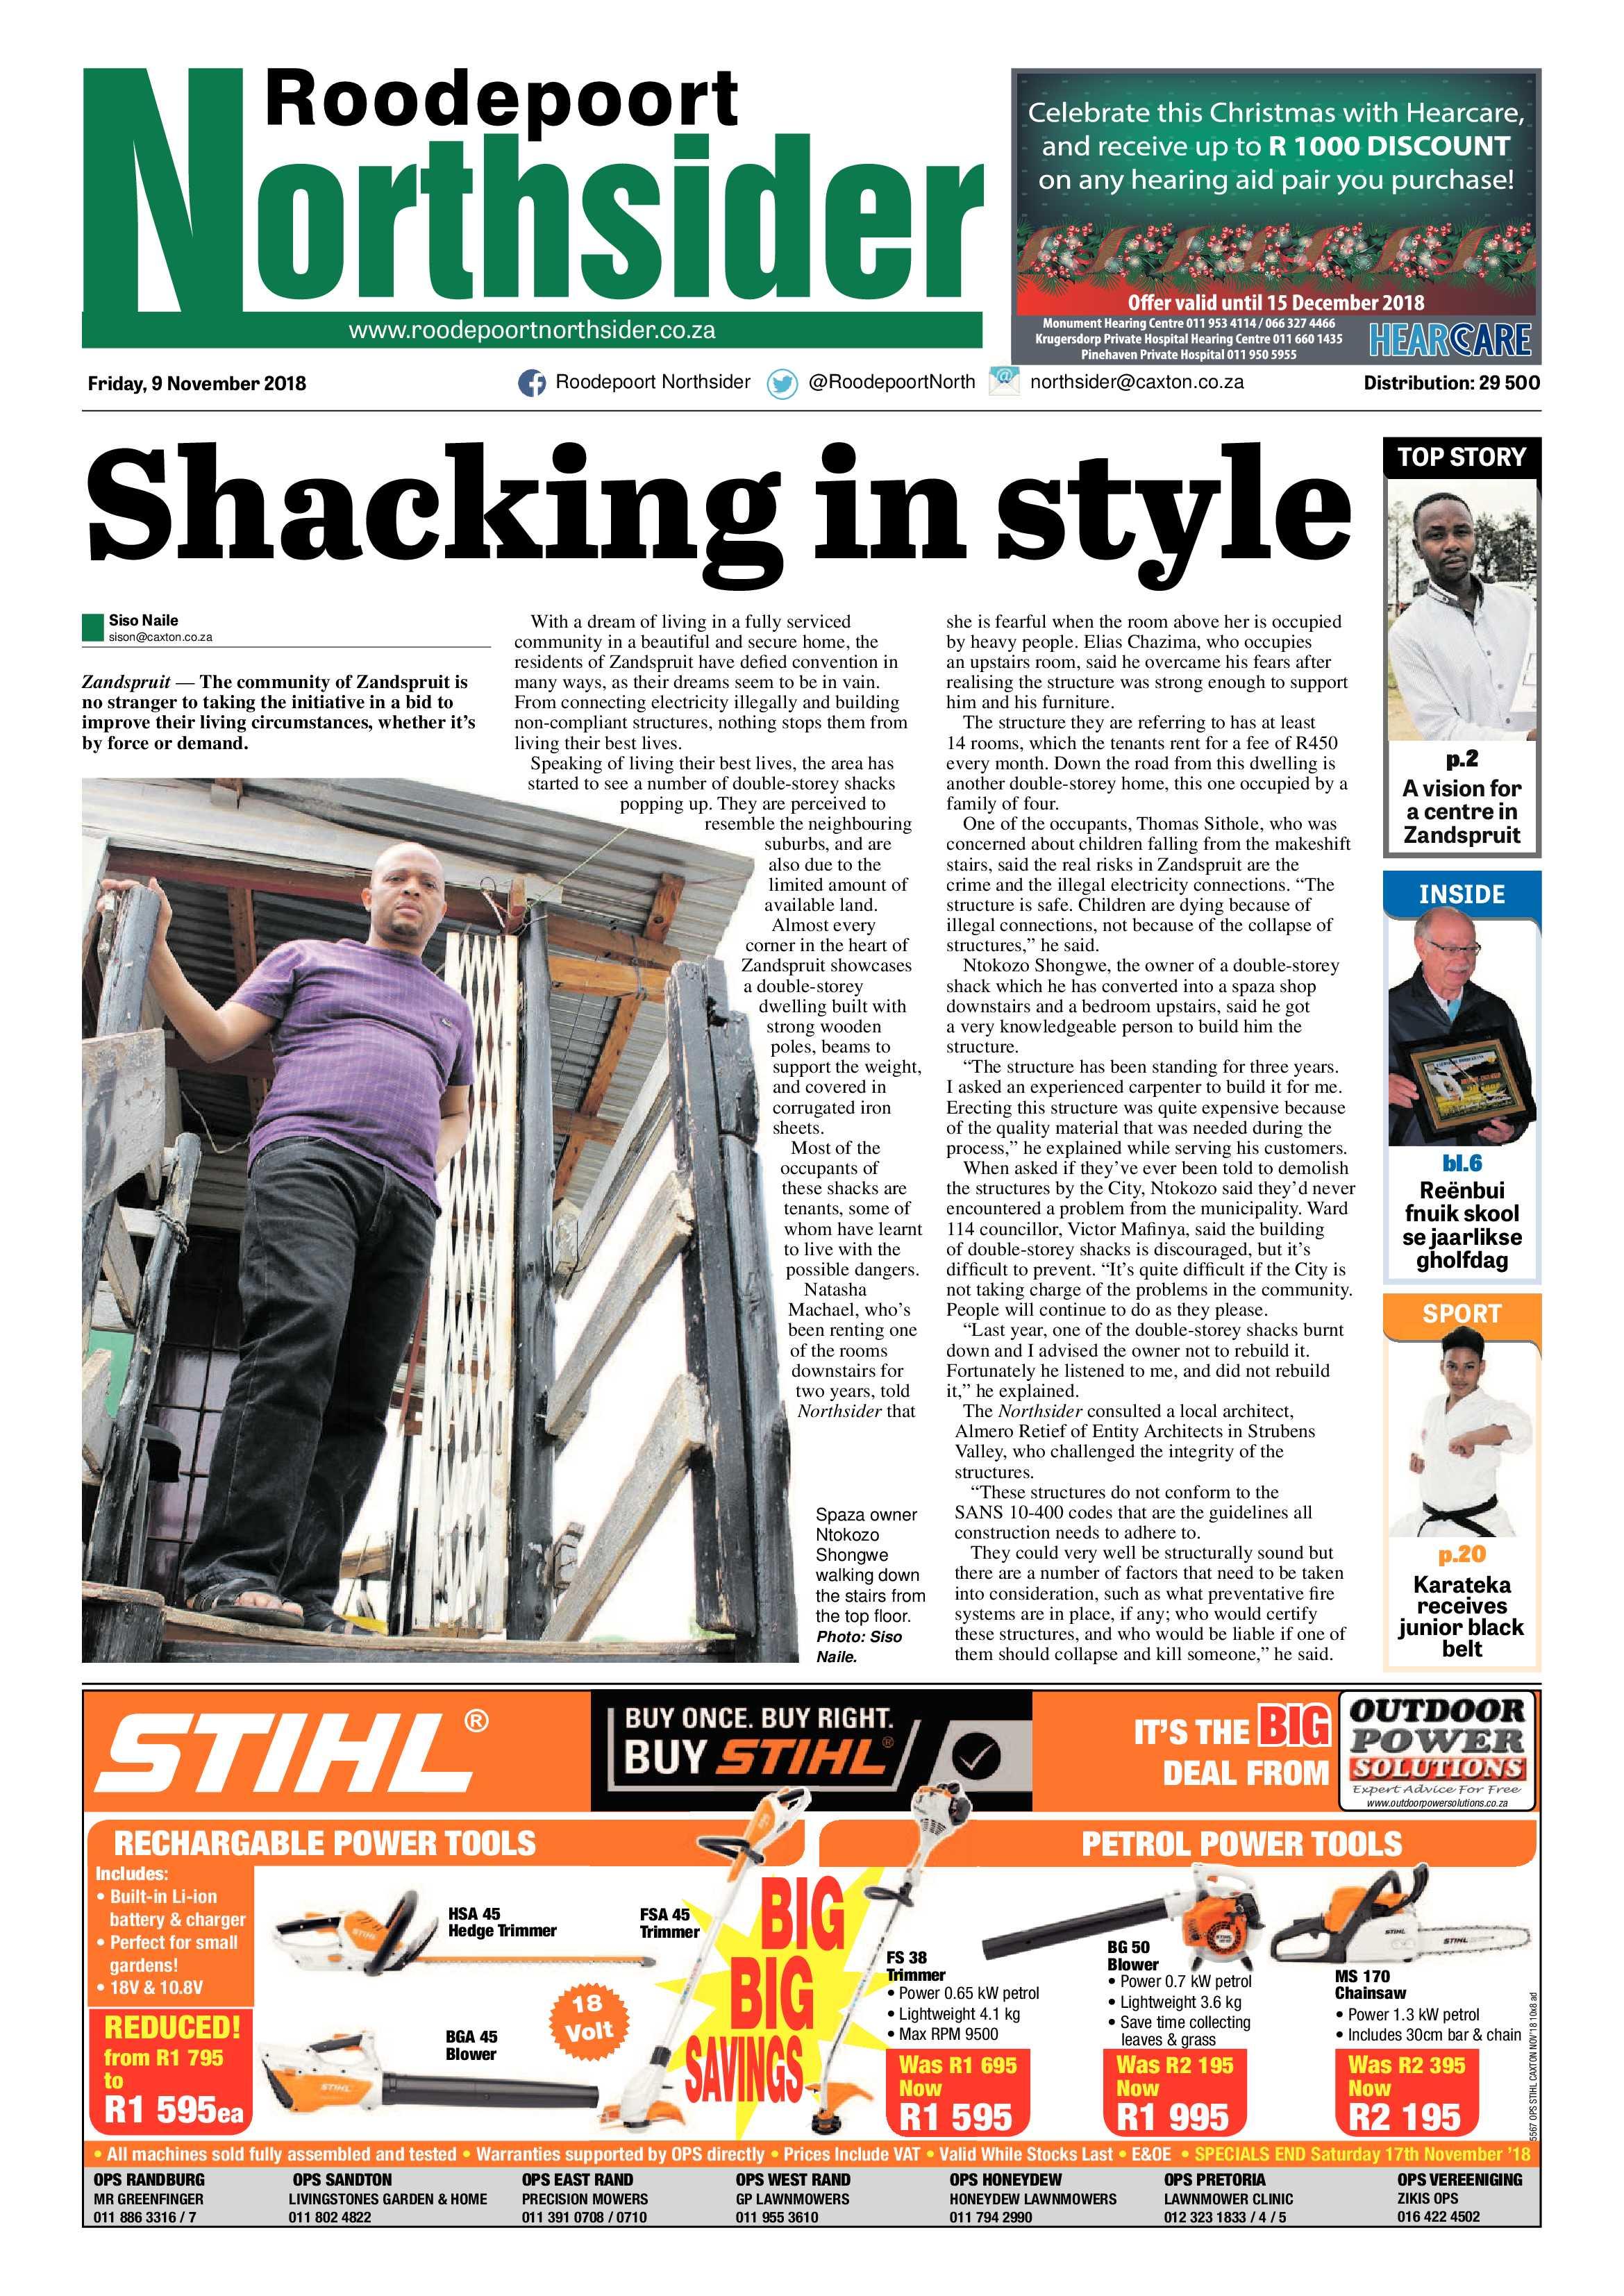 roodepoort-northsider-9-november-2018-epapers-page-1